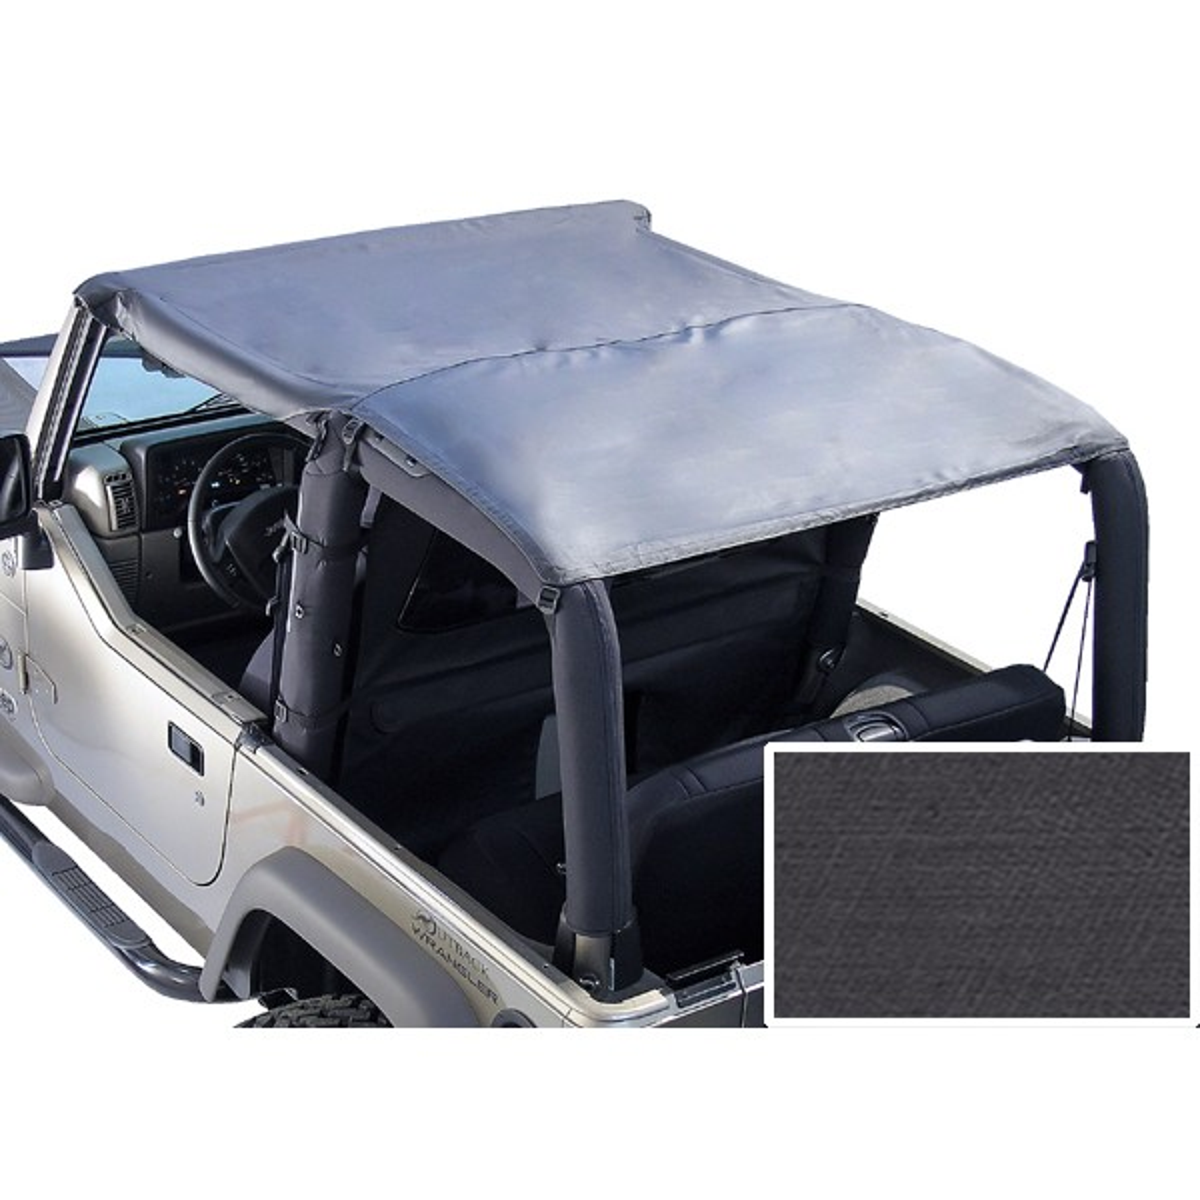 Roll Bar Top Black Denim 76 91 Jeep CJ7 Wrangler YJ